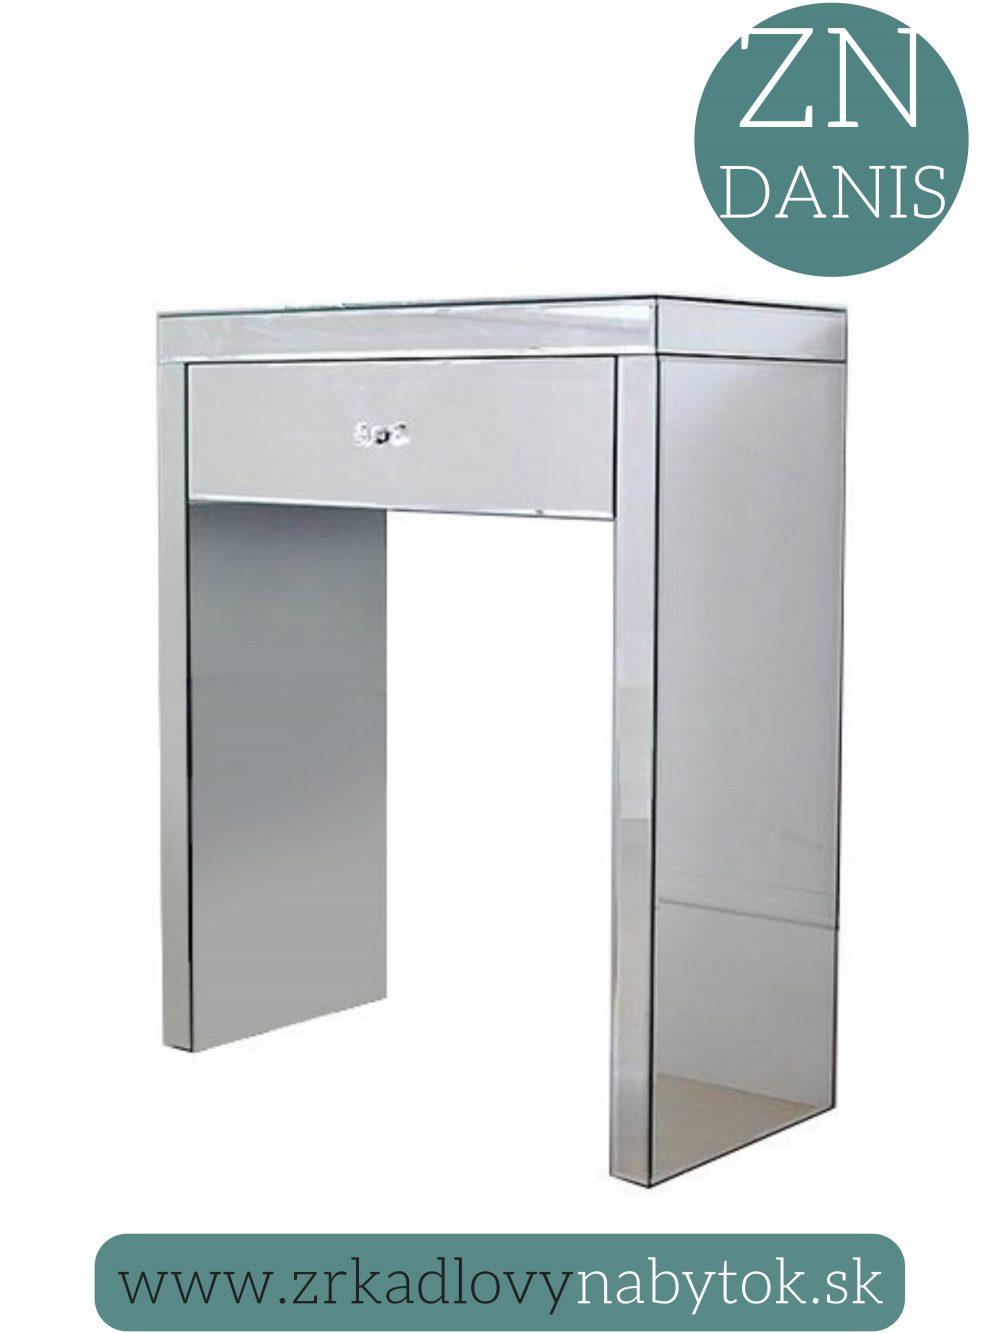 ZNDANIS-196-min